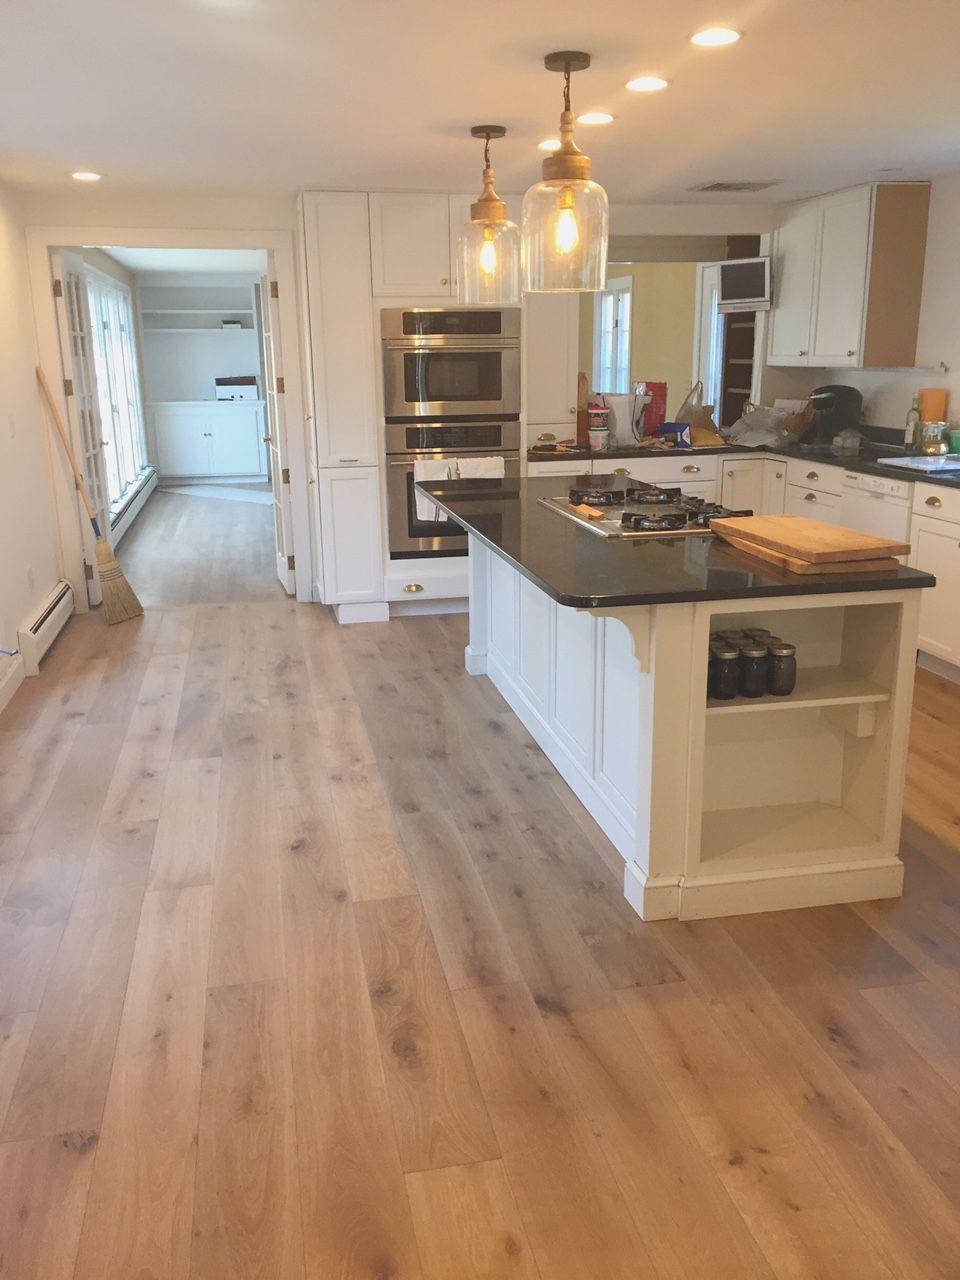 24 White Oak Hardwood Flooring Oak hardwood flooring